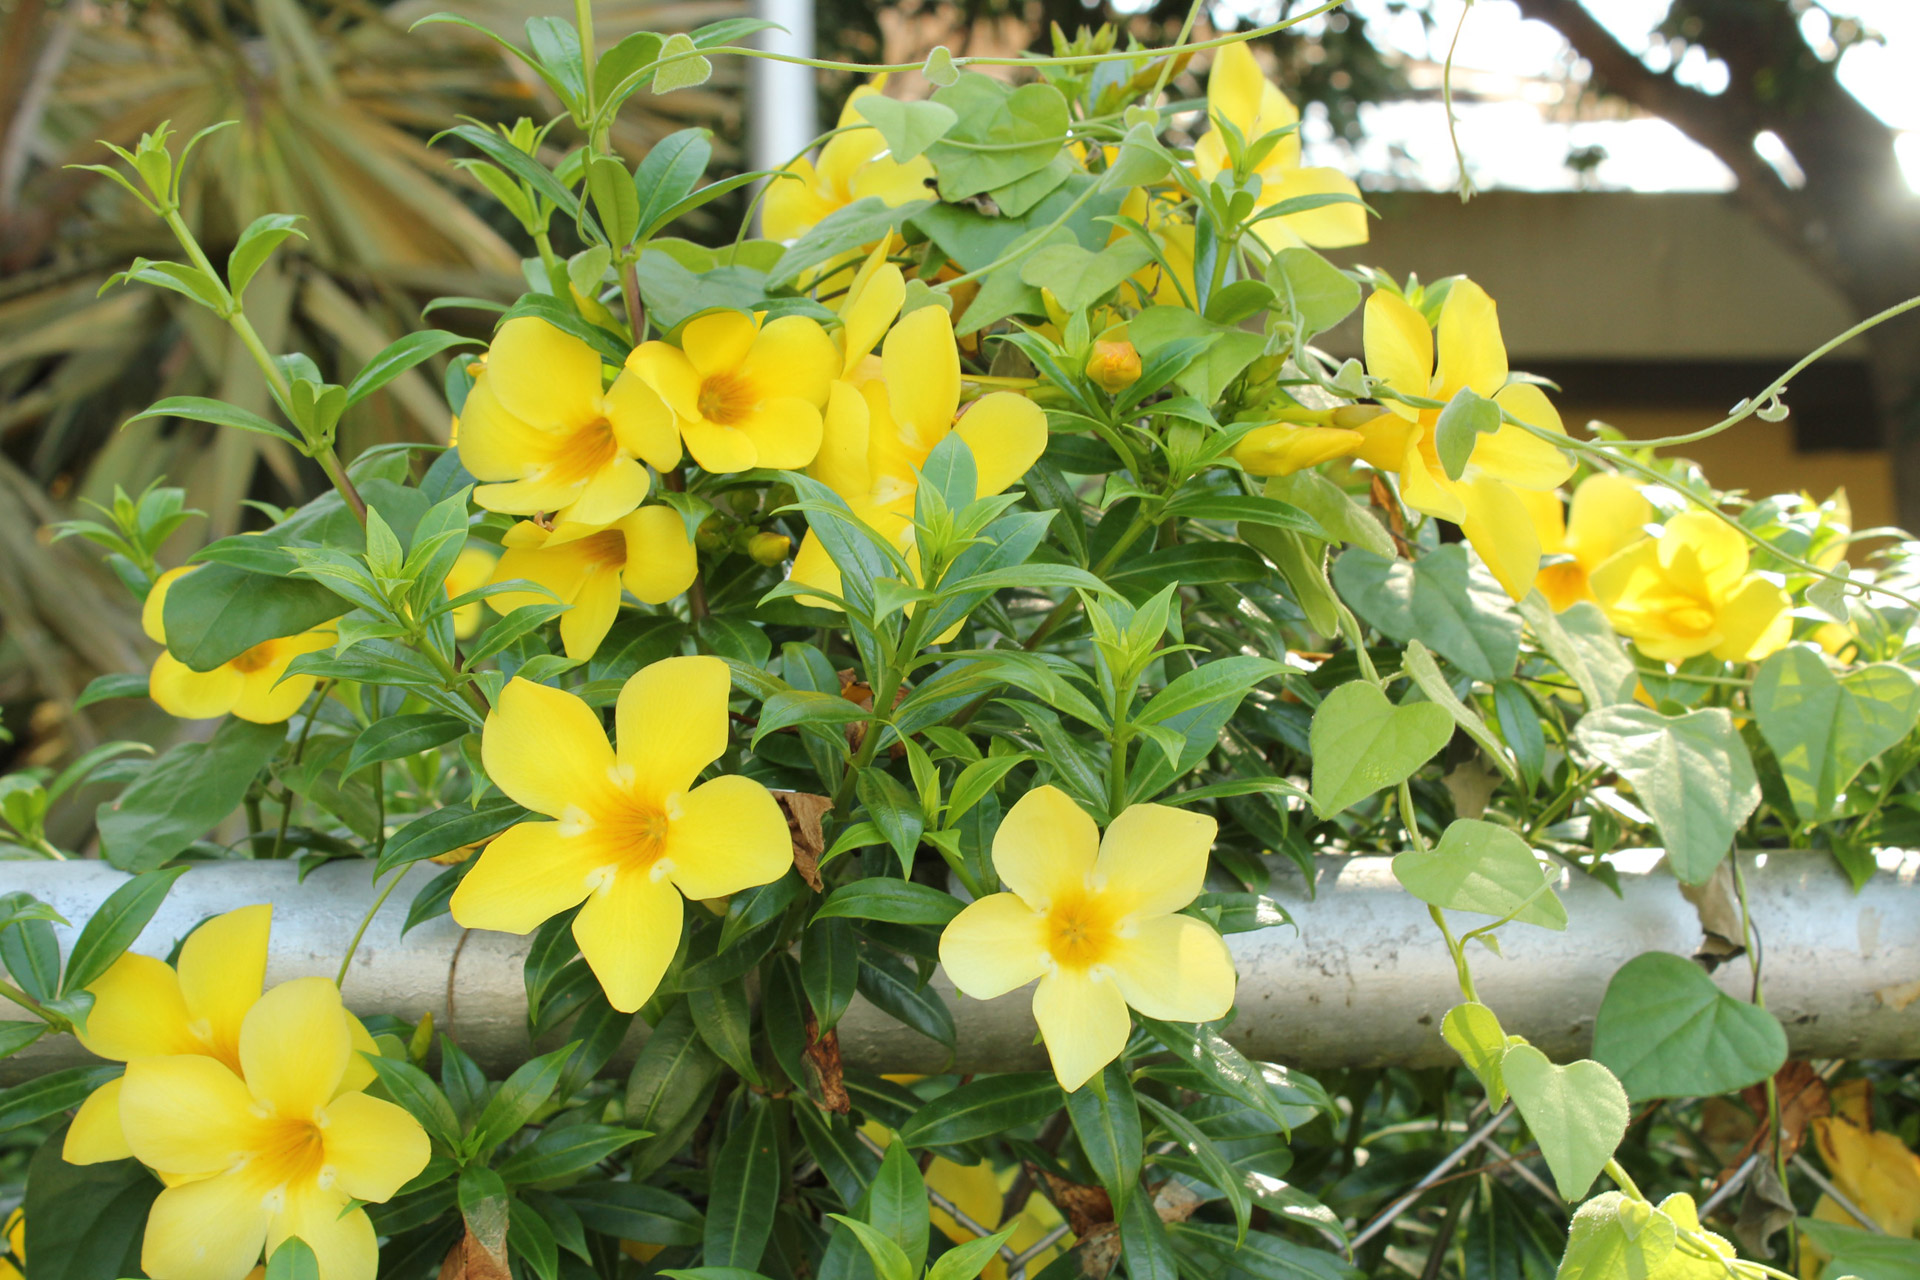 Yellowflowersleavesplantspetals Free Photo From Needpix